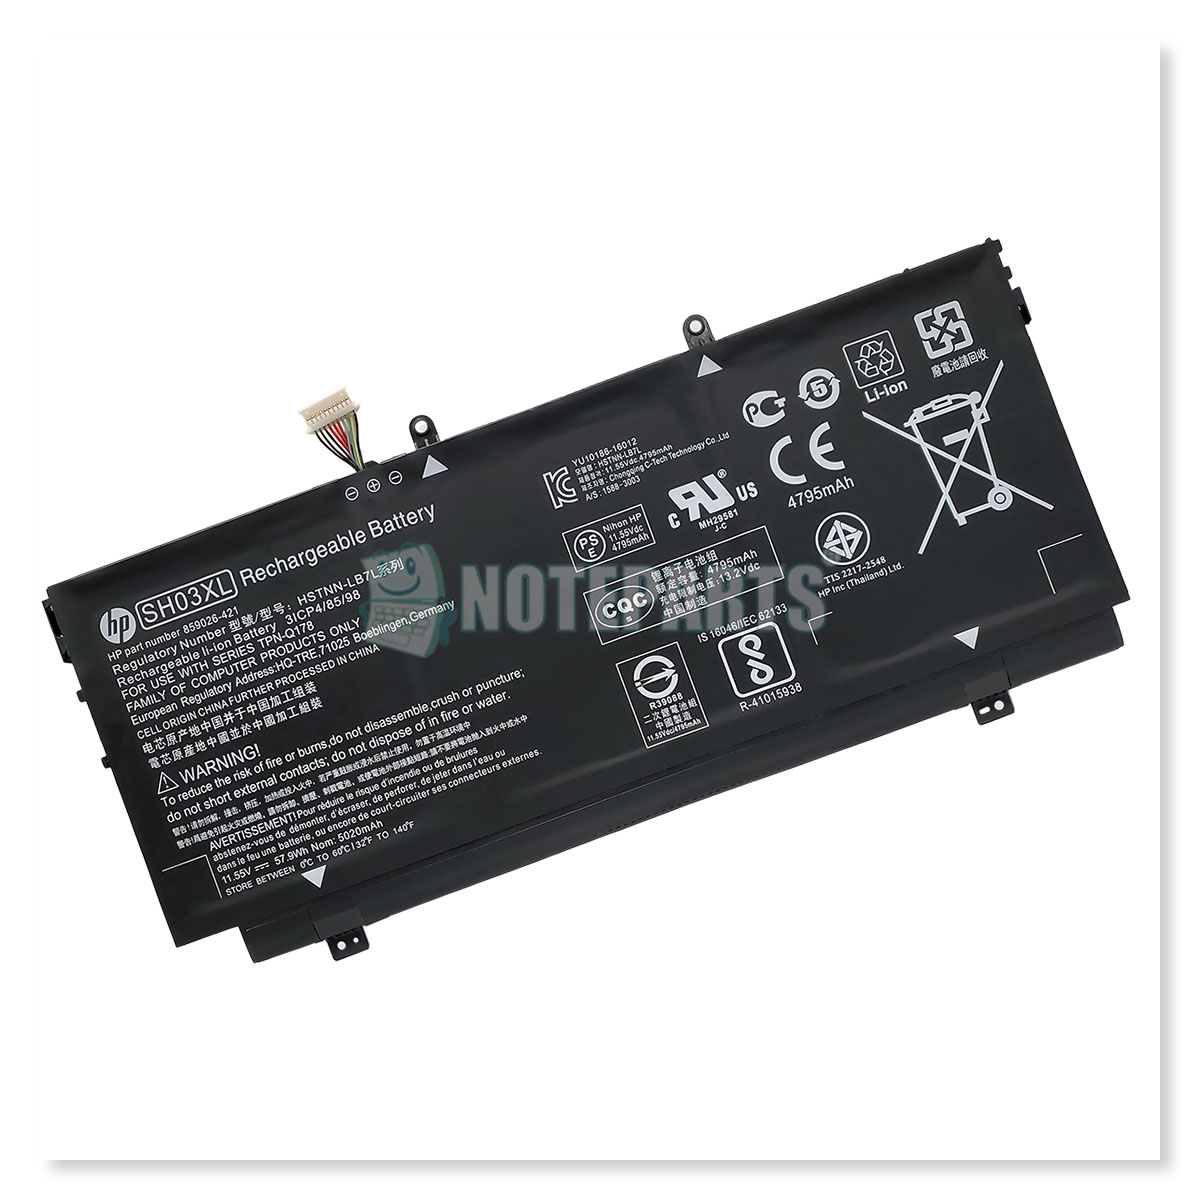 HP純正 Spectre x360 13-ac000 バッテリー SH03XL CN03XL 859026-421 901345-855 HSTNN-LB7L